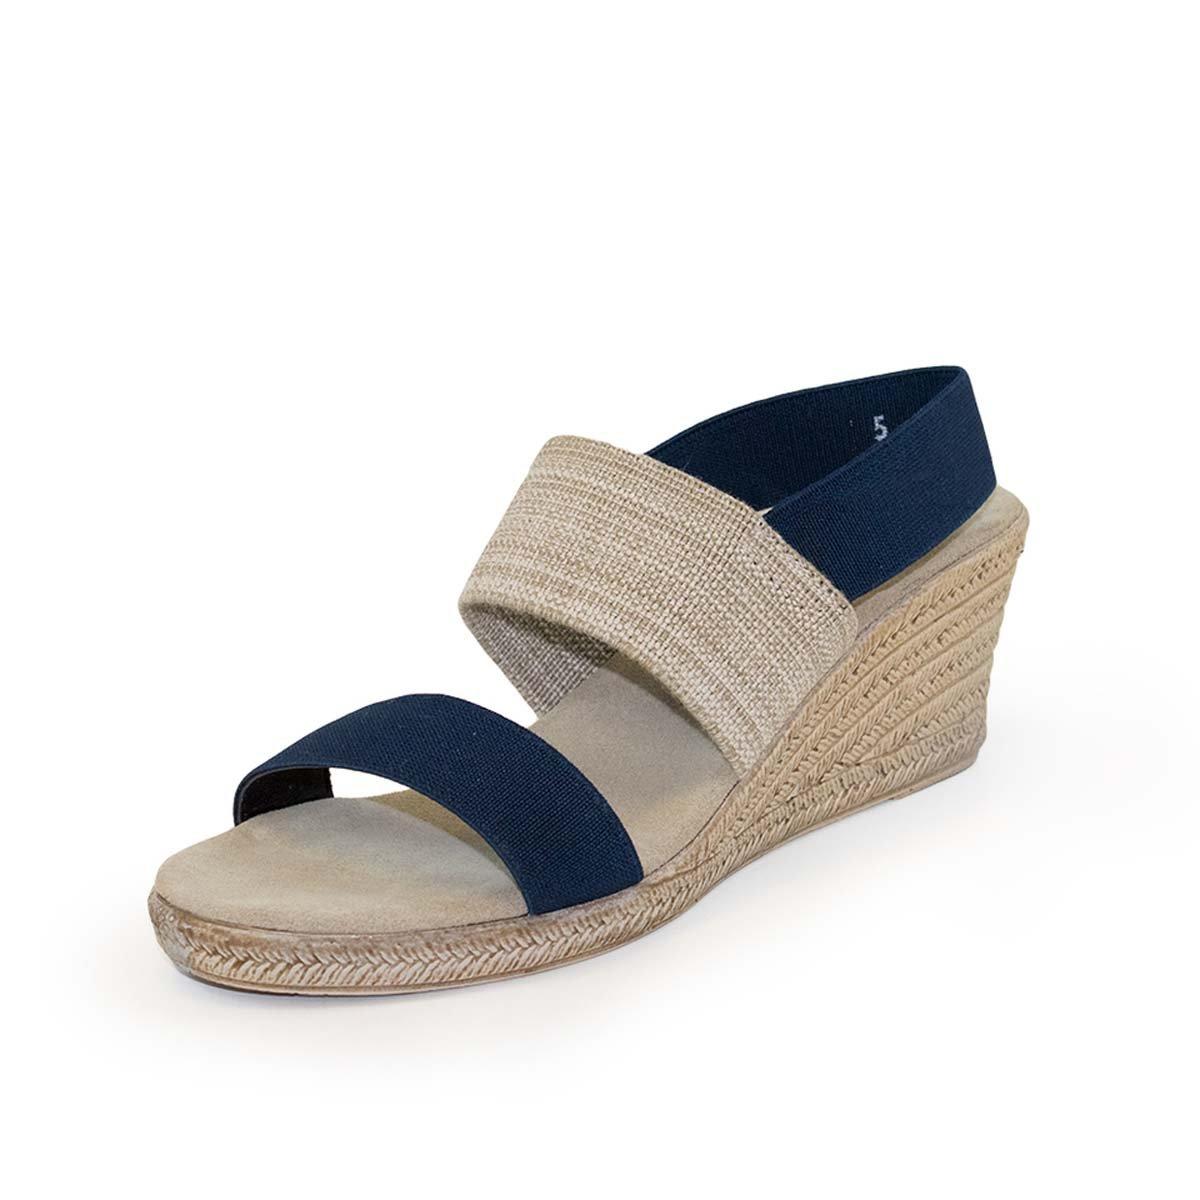 Cooper Sling-Back Espadrille Wedge Sandal by Charleston Shoe Co. B07DRJF9F7 8 B(M) US|Navy